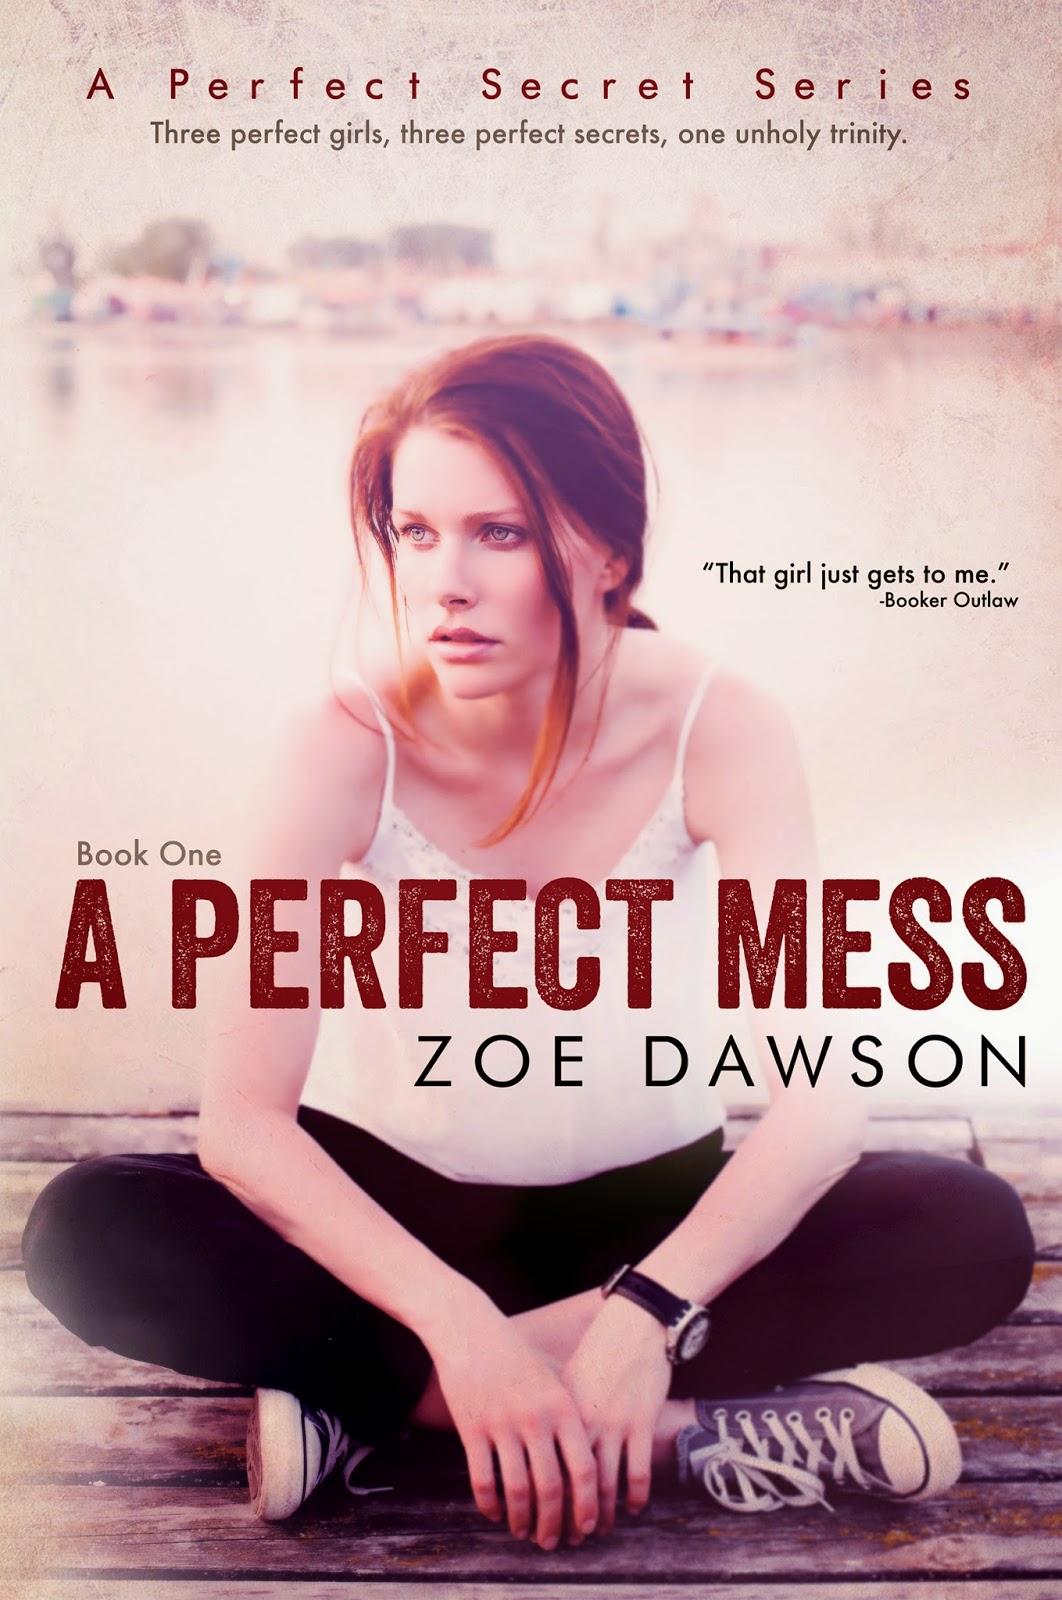 http://zoedawson.com/books/a-perfect-mess/